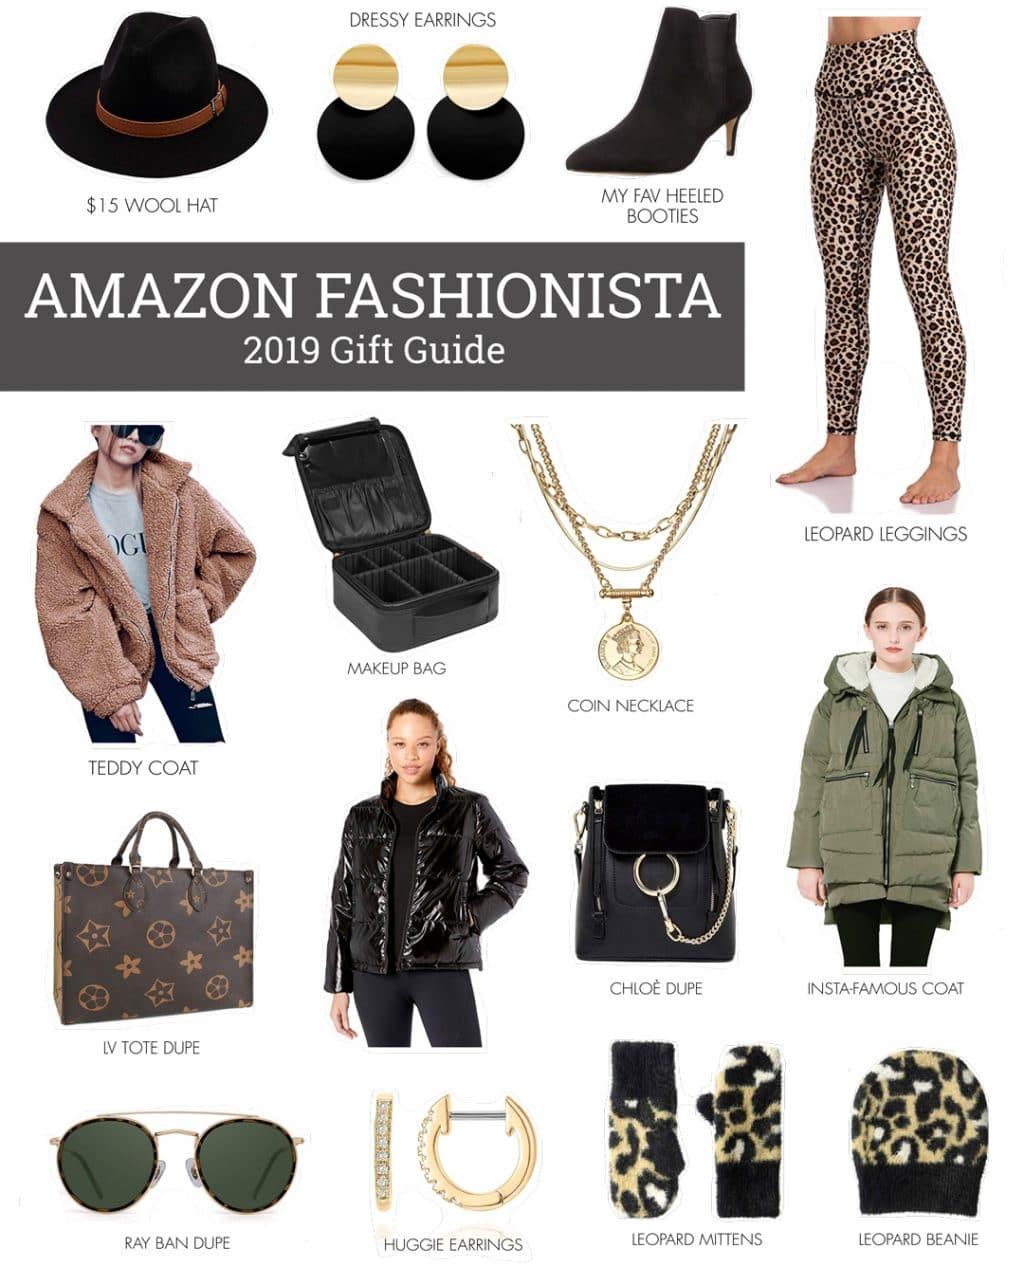 GG-2019-amazon-fashionista